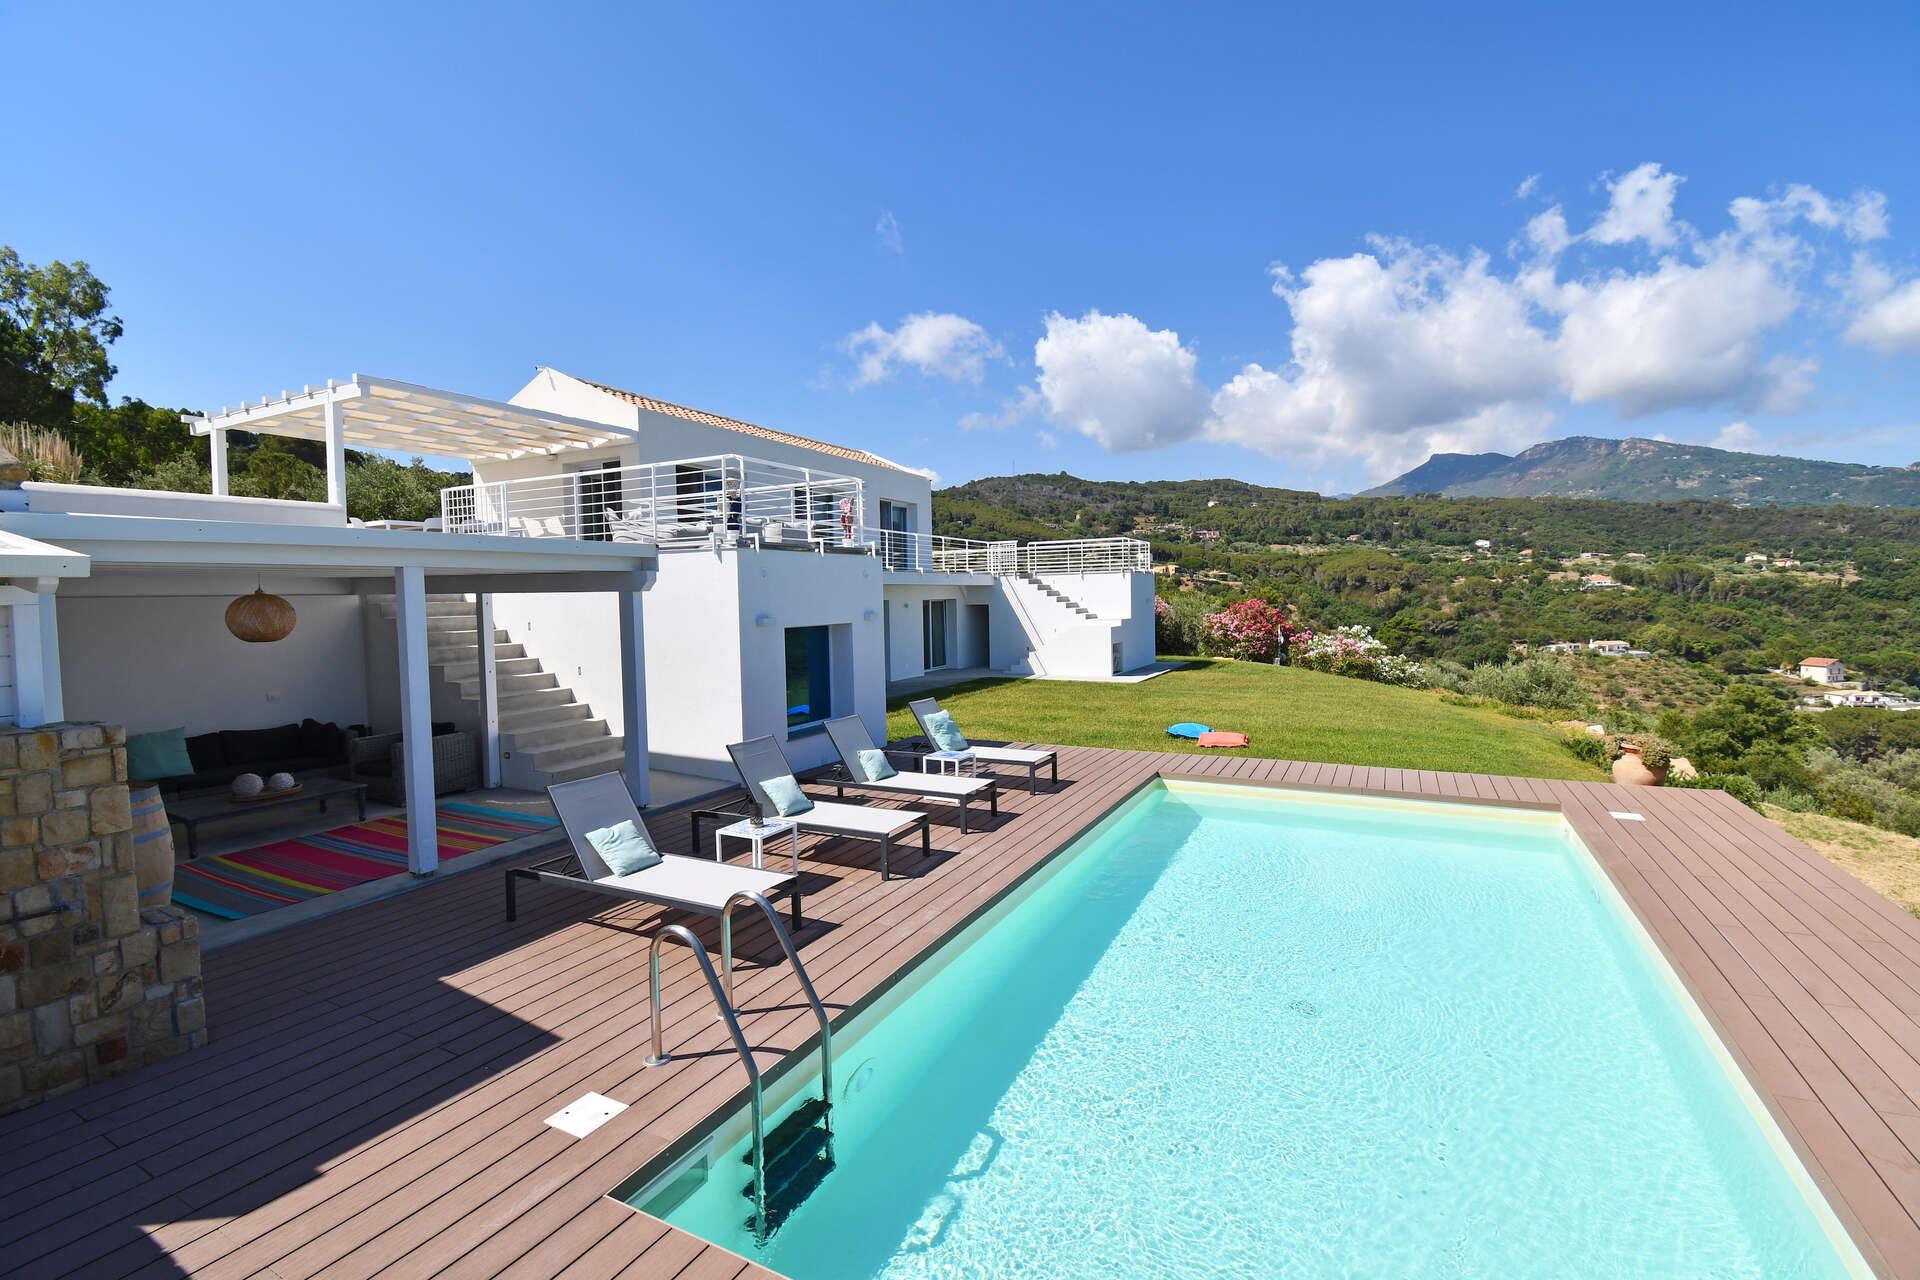 Luxury vacation rentals europe - Italy - Sicily - Cefalu - Rita - Image 1/19